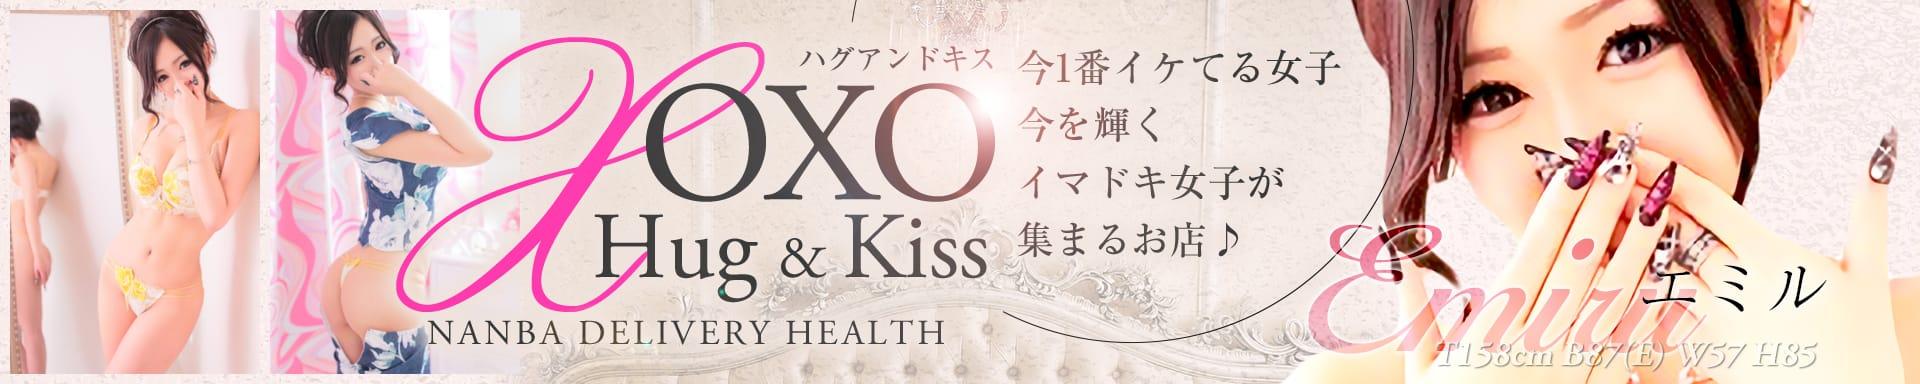 XOXO Hug&Kiss (ハグアンドキス) その3